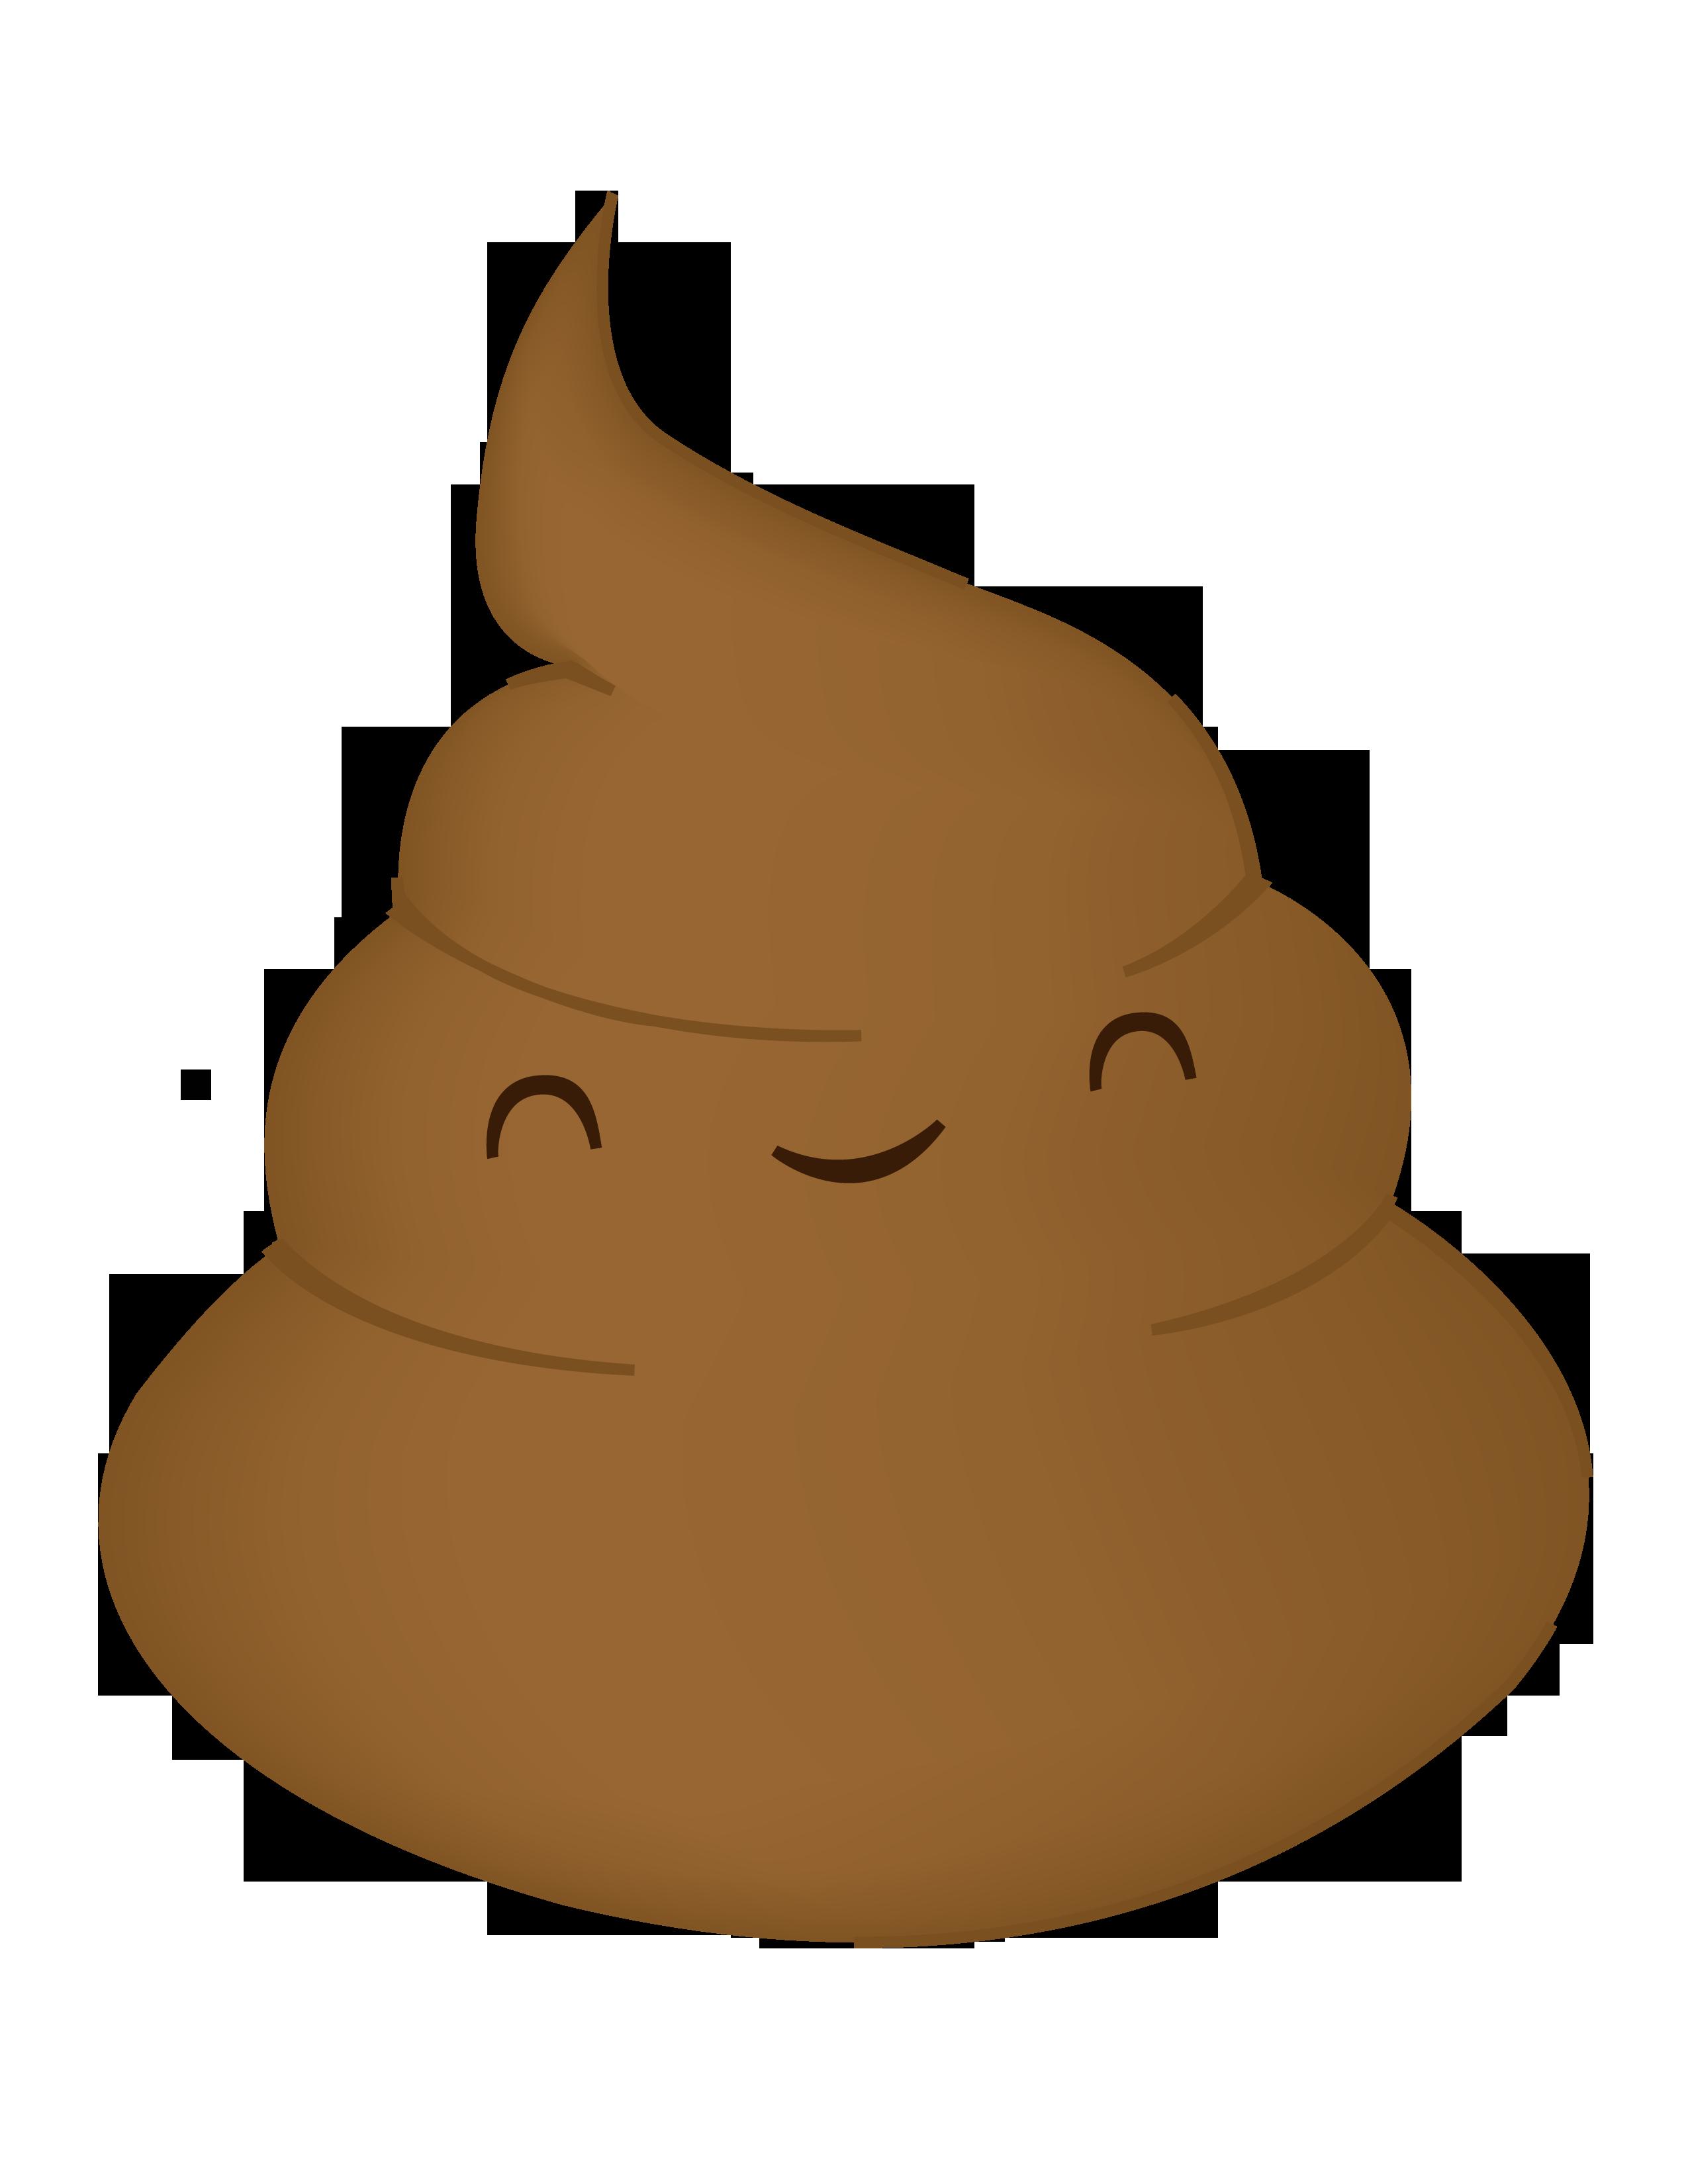 Poop clipart no background.